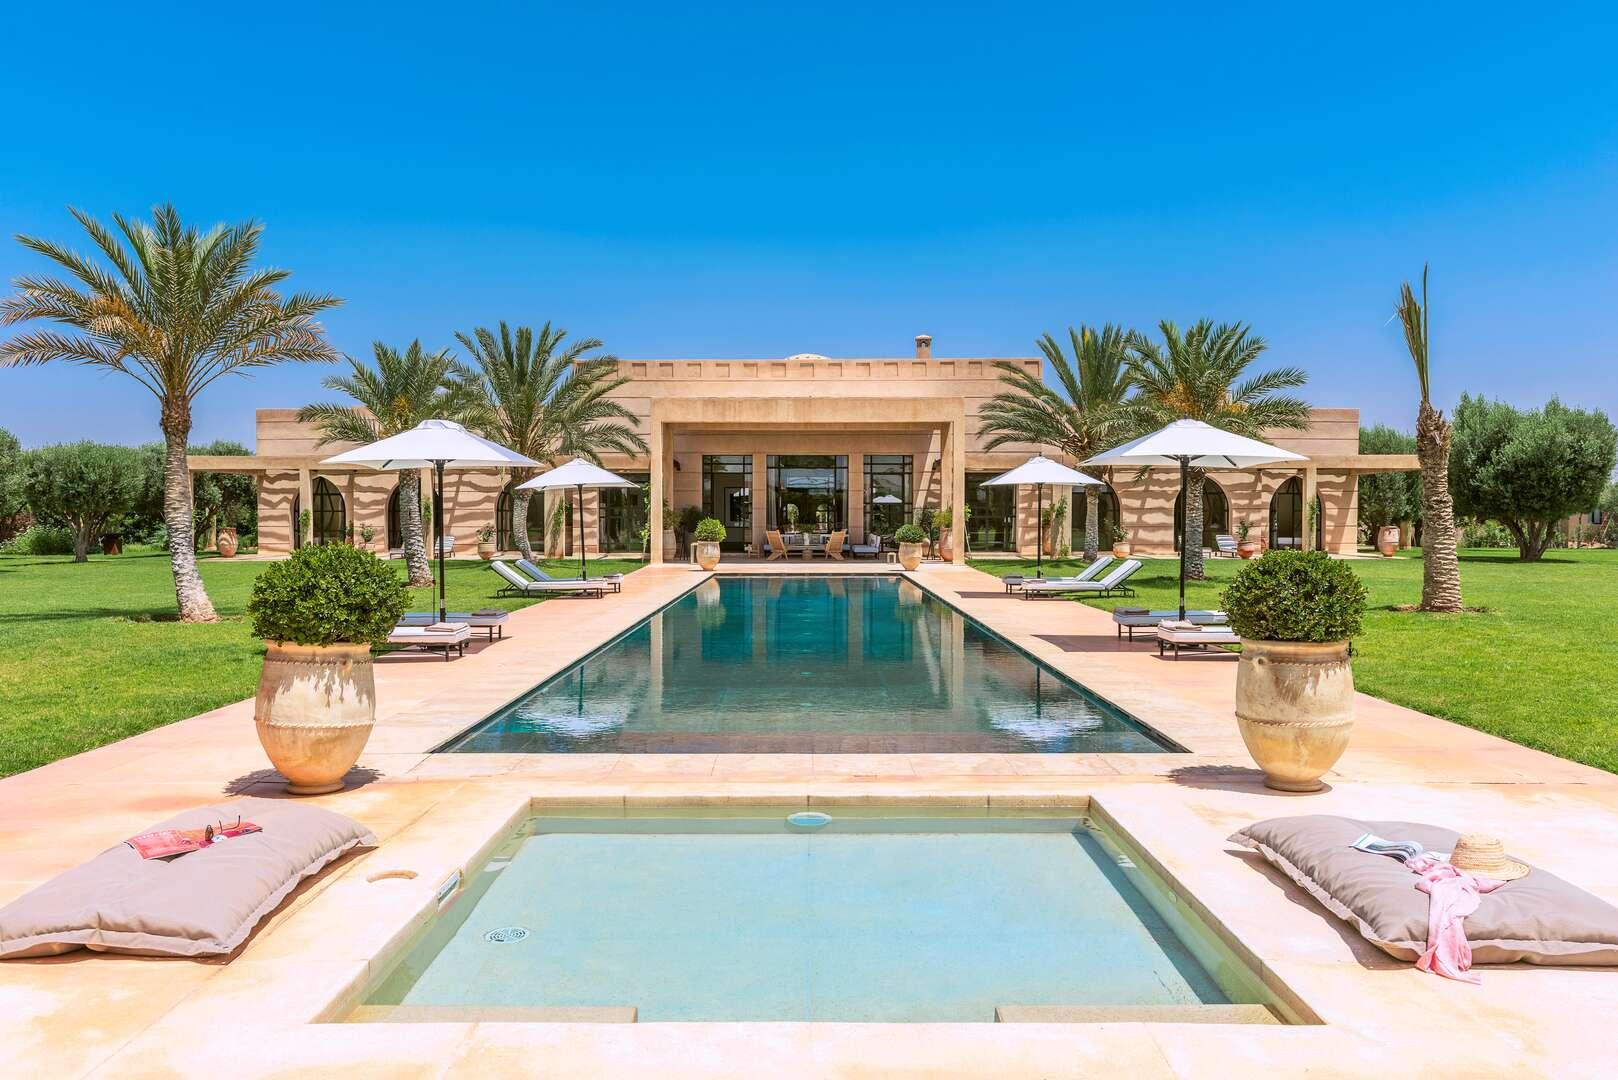 - Villa Saha - Image 1/25